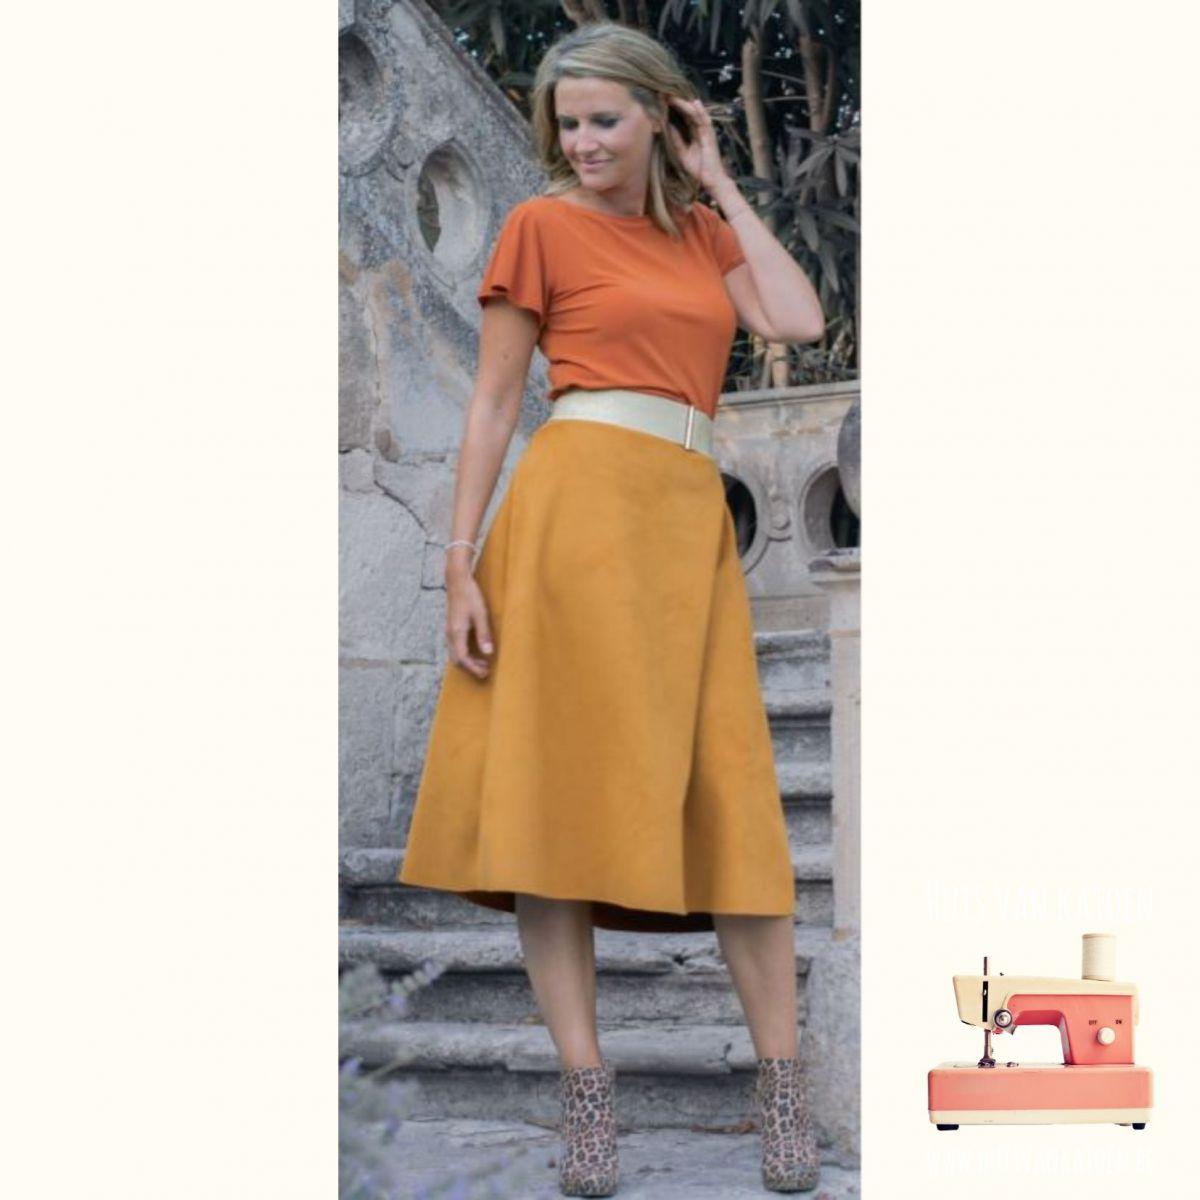 Bel'etoile - Cora shirt en rok